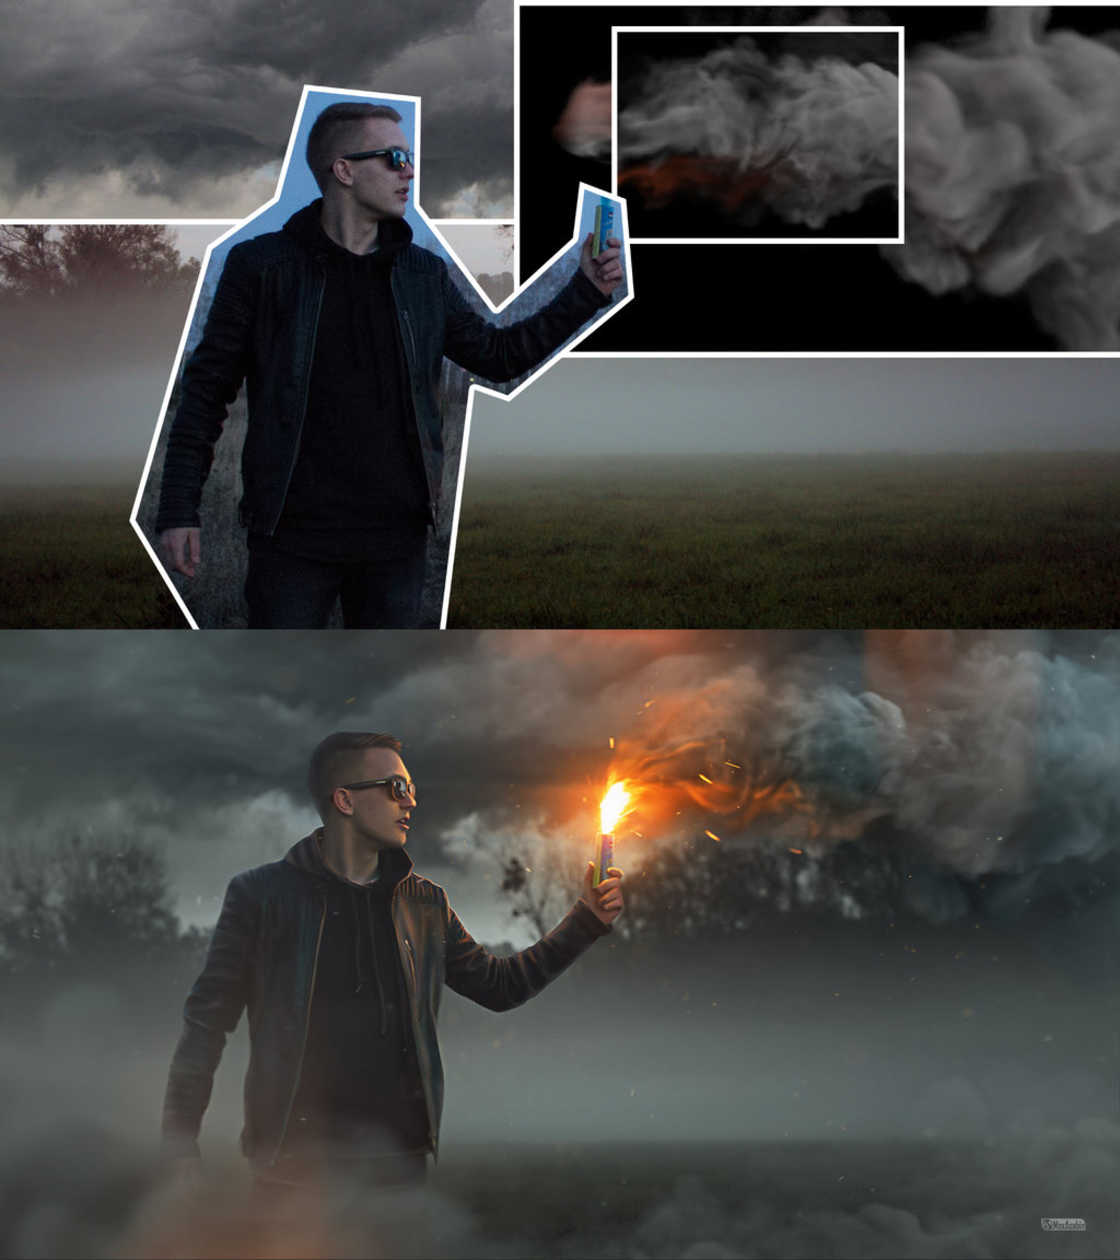 When a retoucher reveals his impressive skills on Photoshop